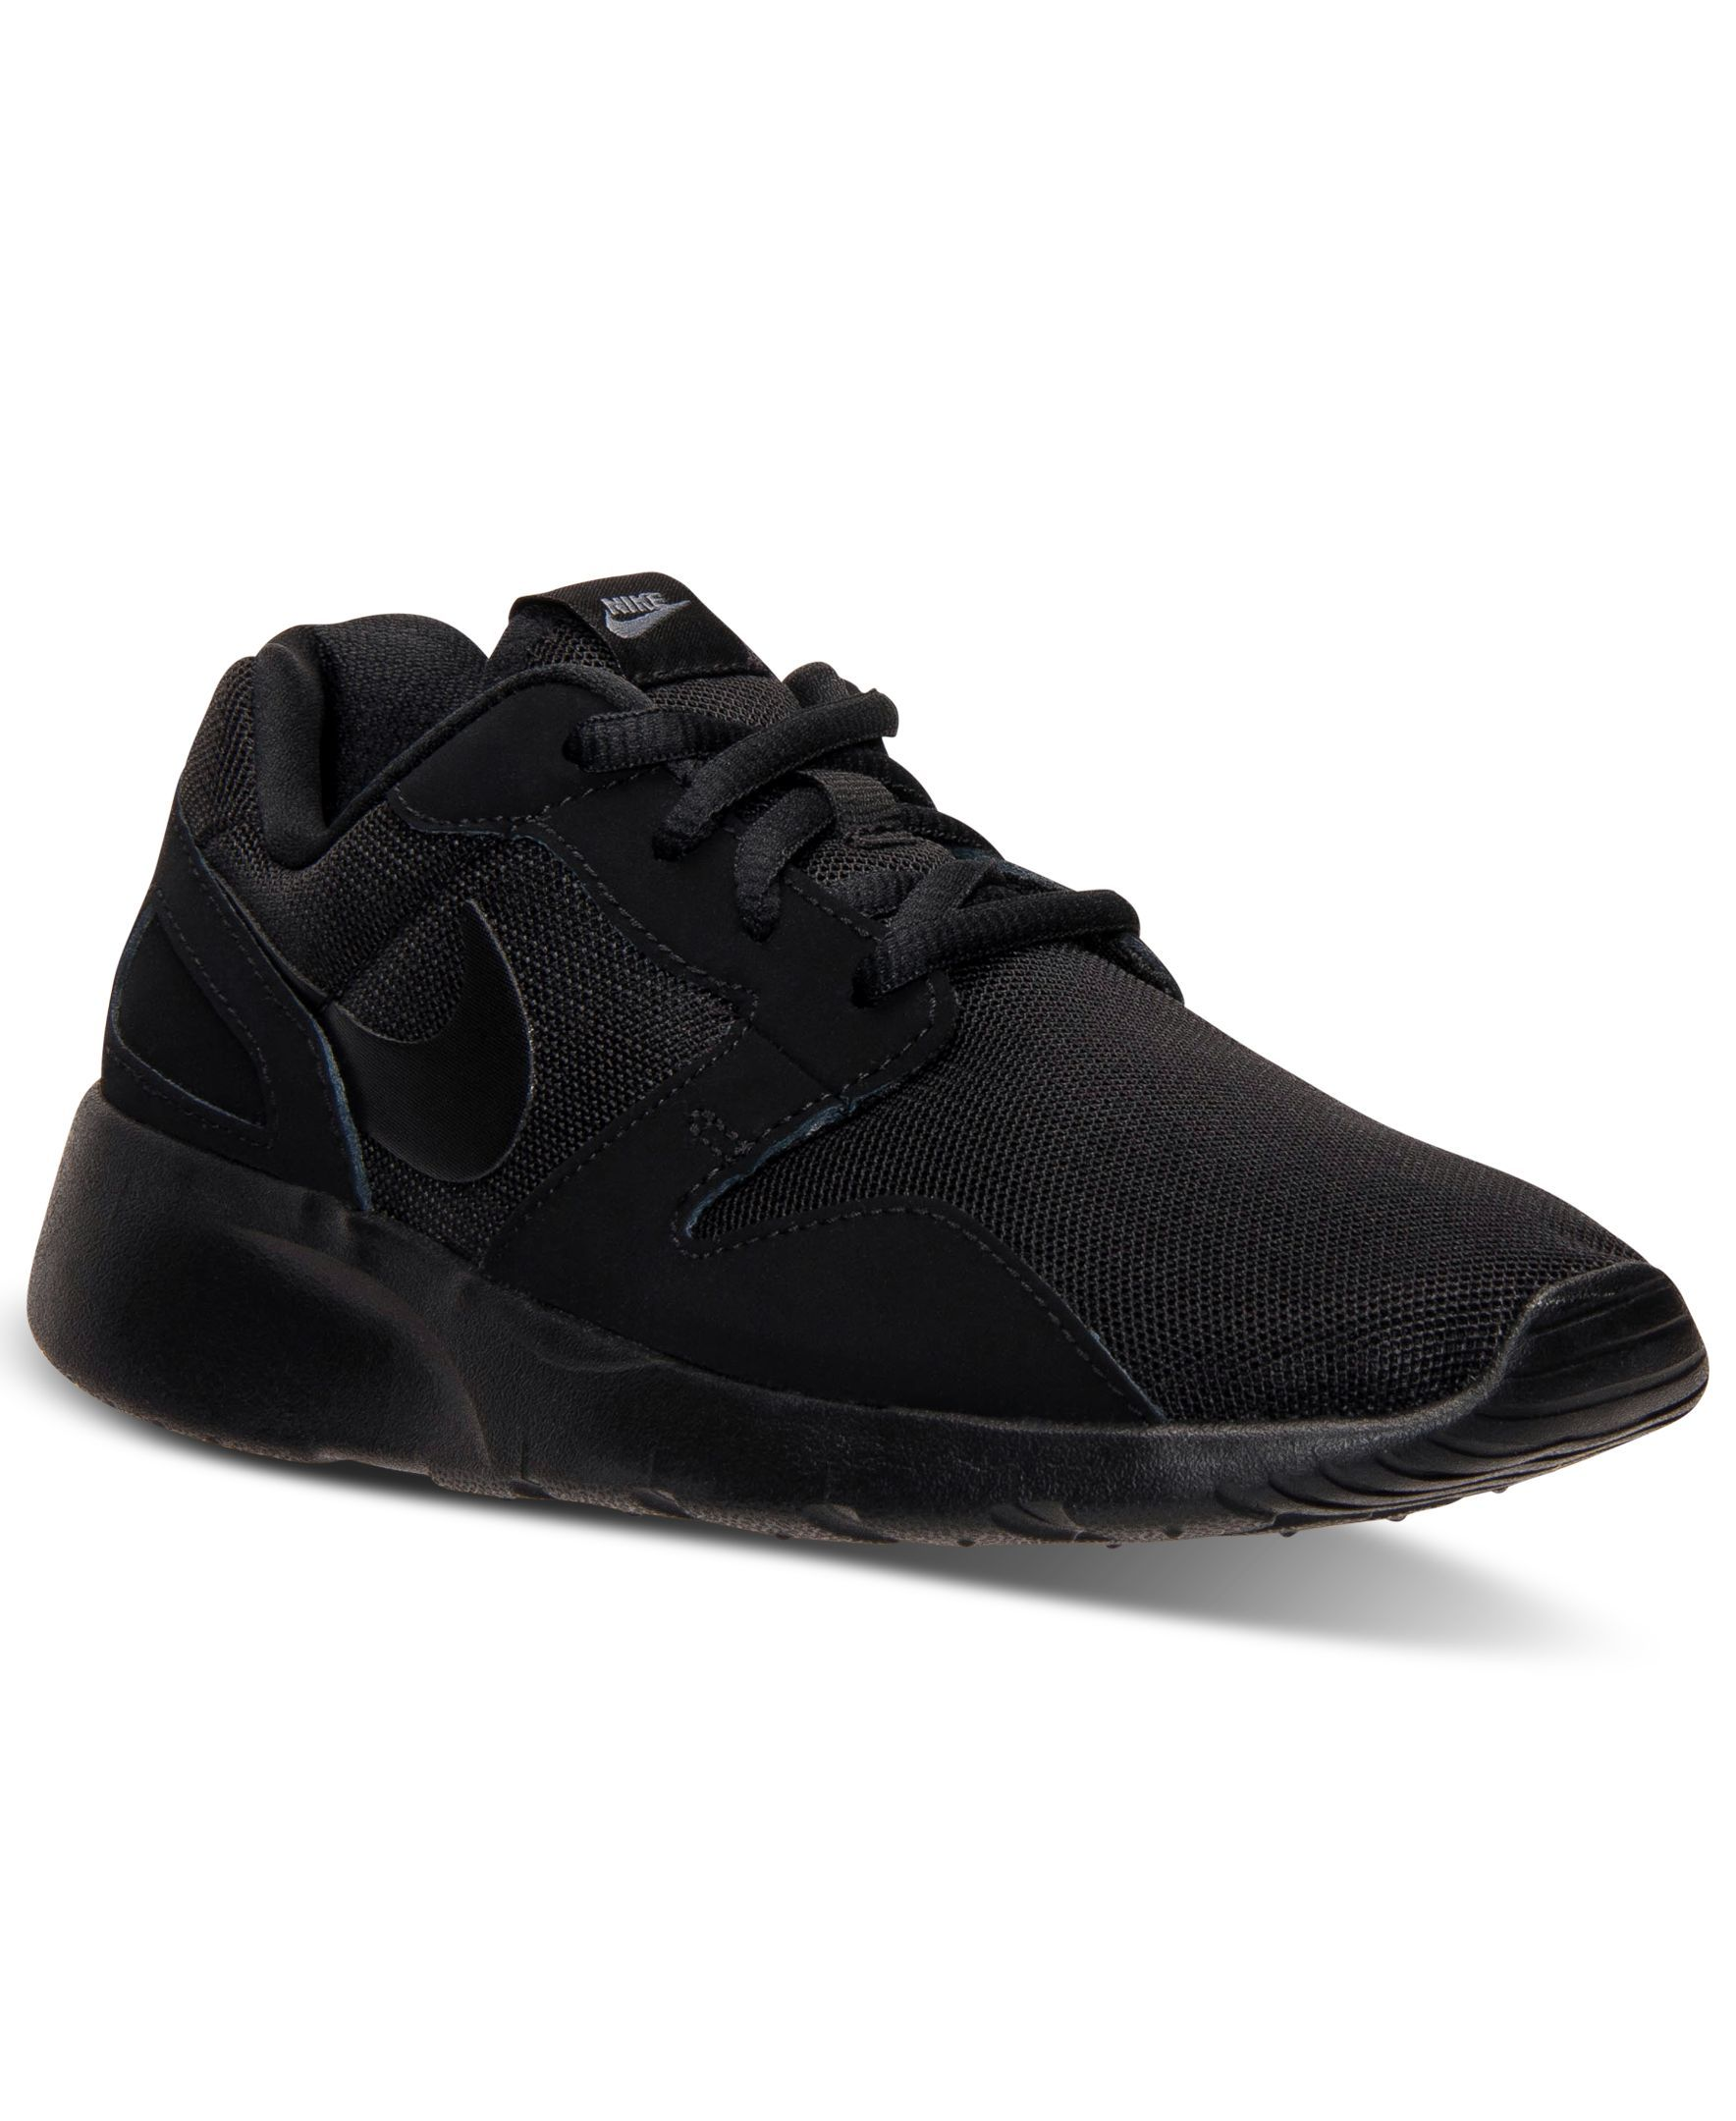 buy popular e06b1 a3711 Nike Boys Kaishi Casual Sneakers from Finish Line Ligne Darrivée,  Espadrilles Détentes